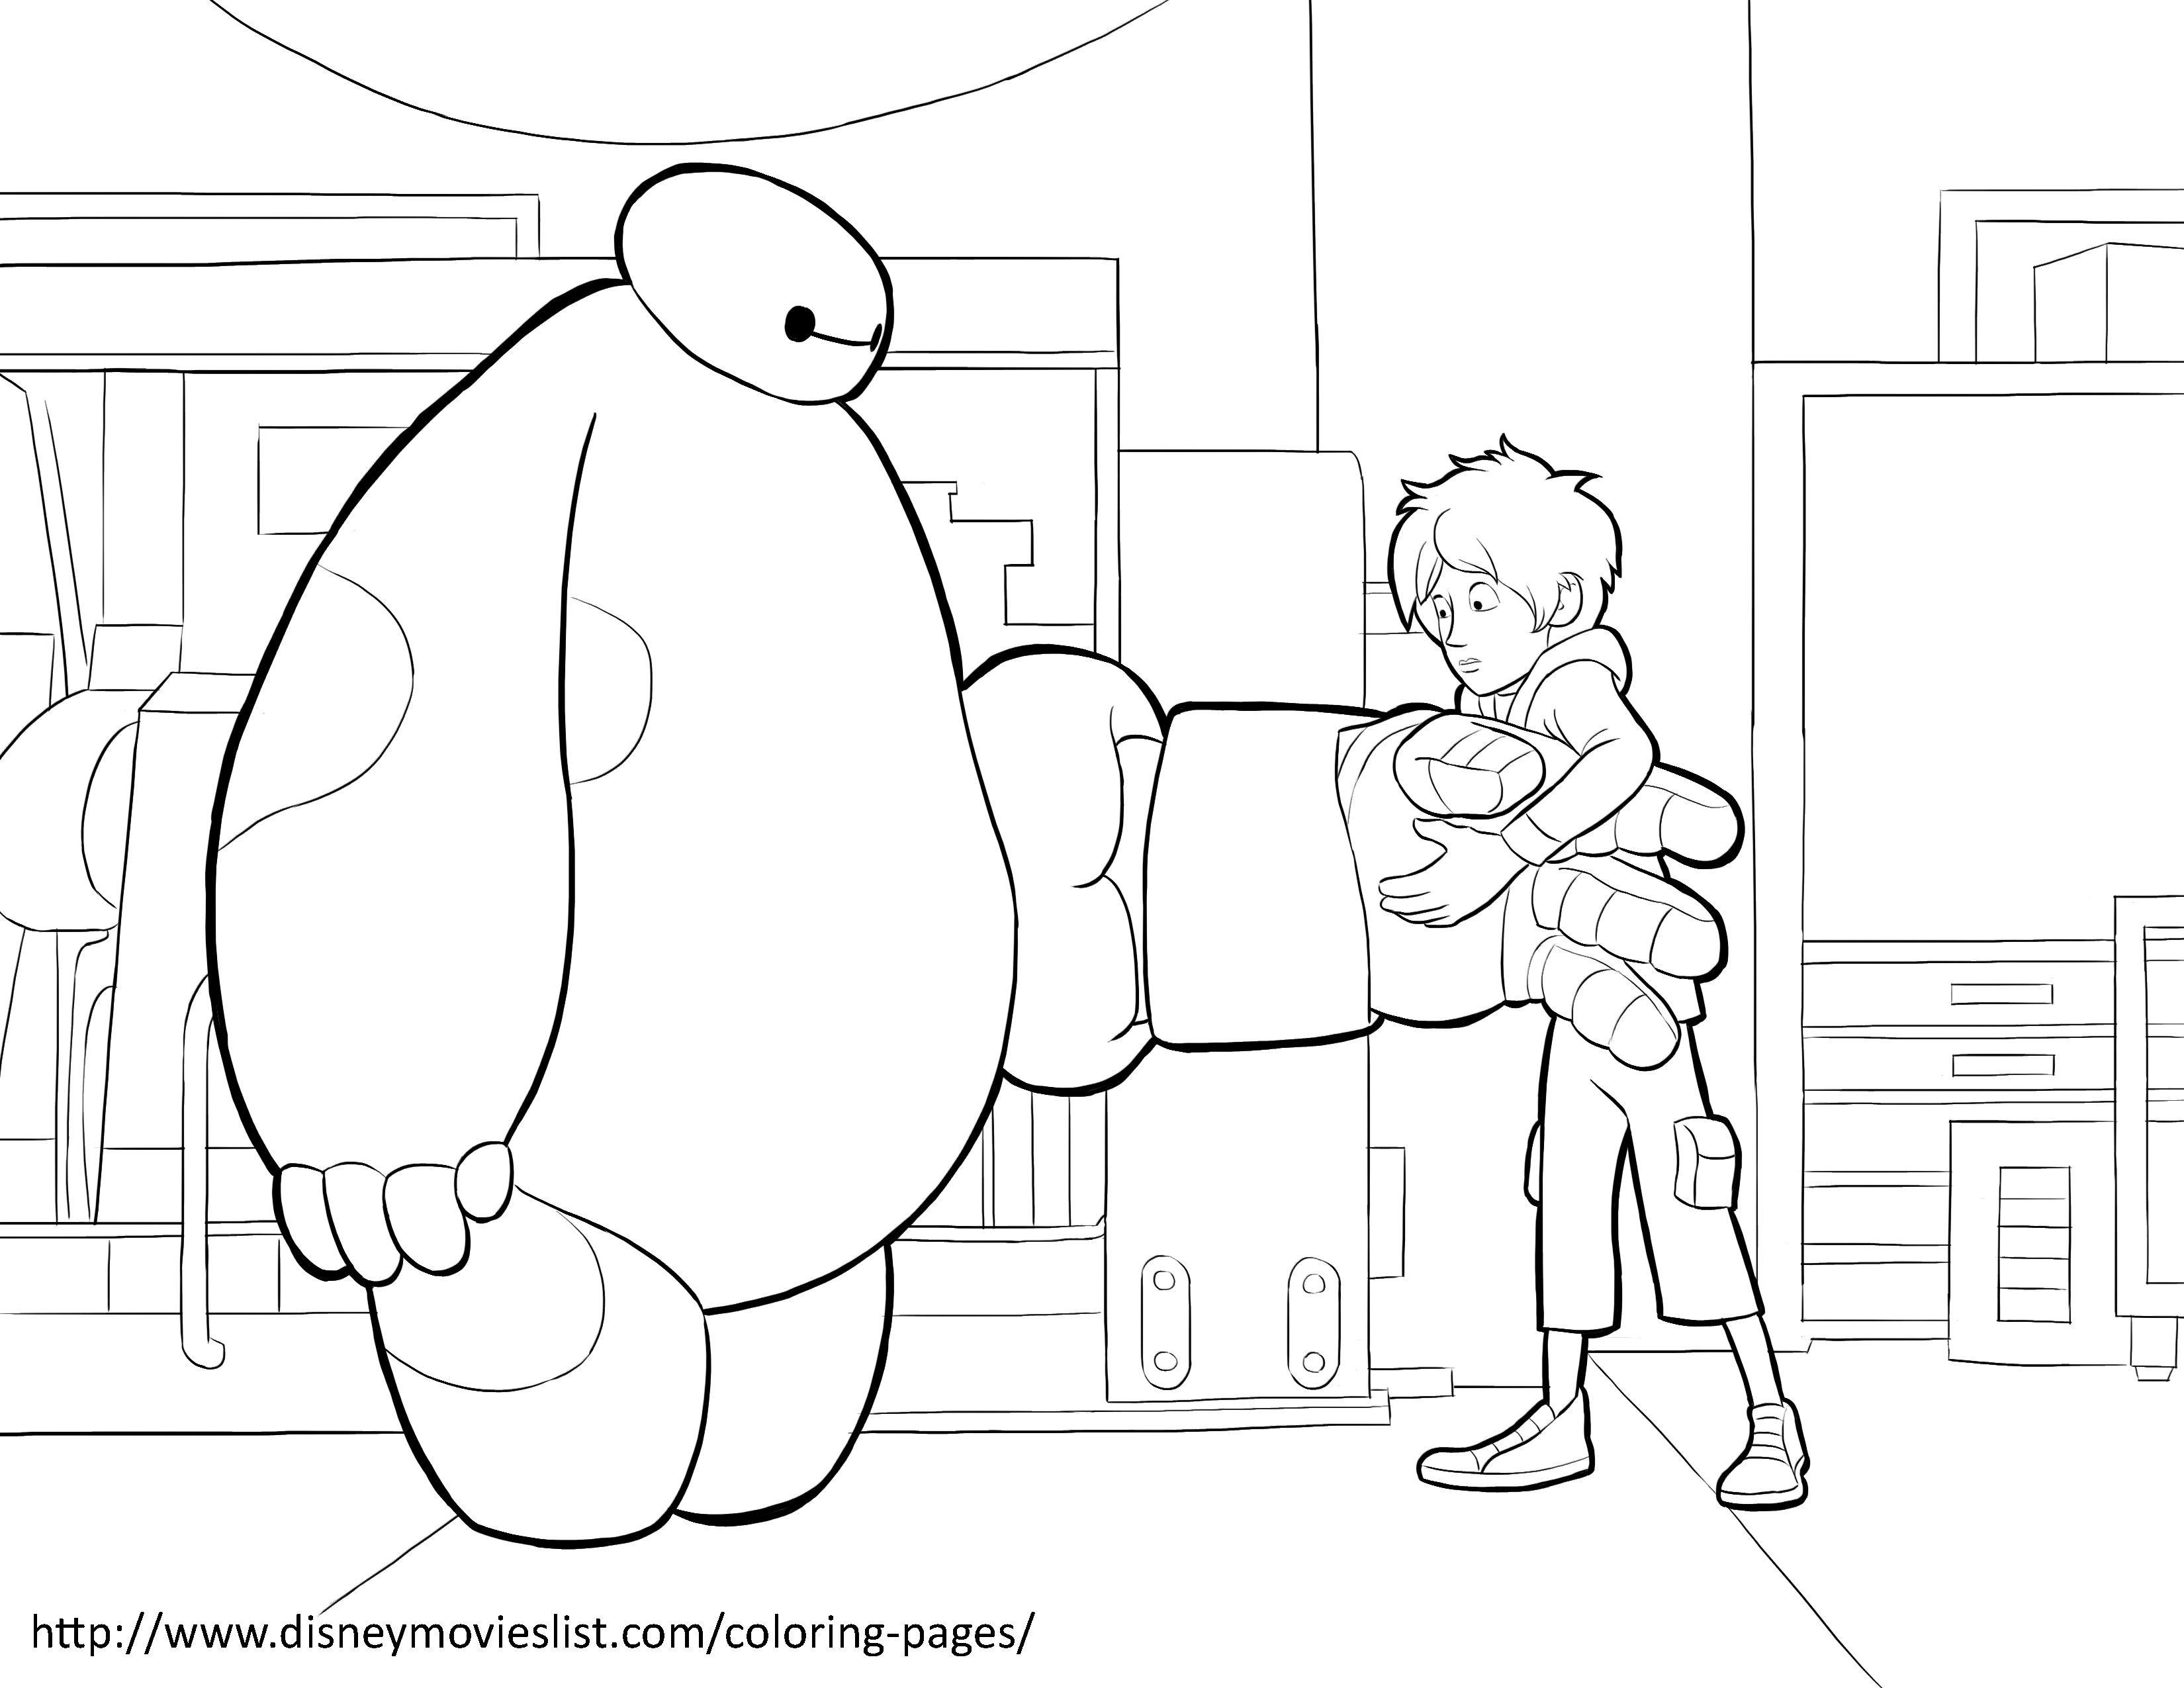 Disney S Big Hero 6baymax Suiting Up Coloring Page